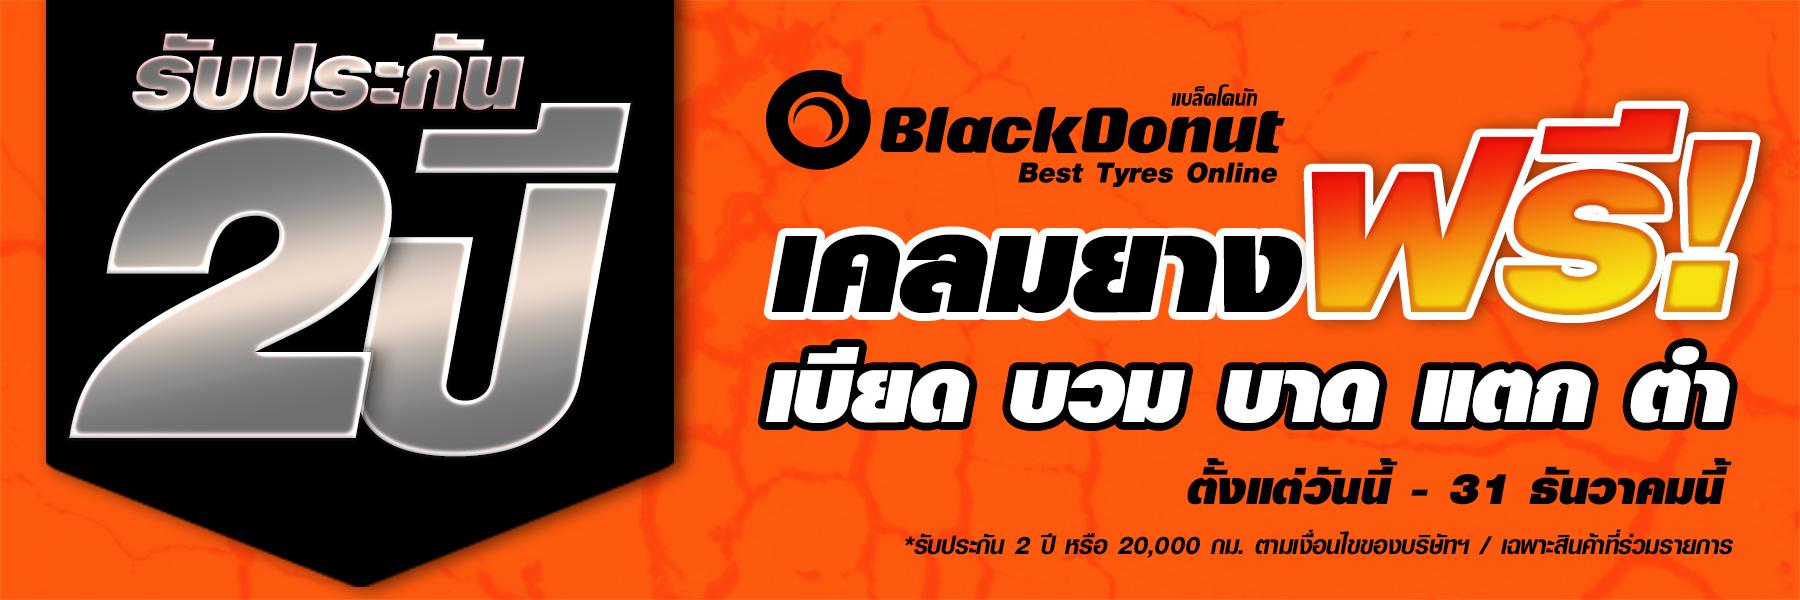 BlackDonut-Banner-1800x600-01-v2 (4)